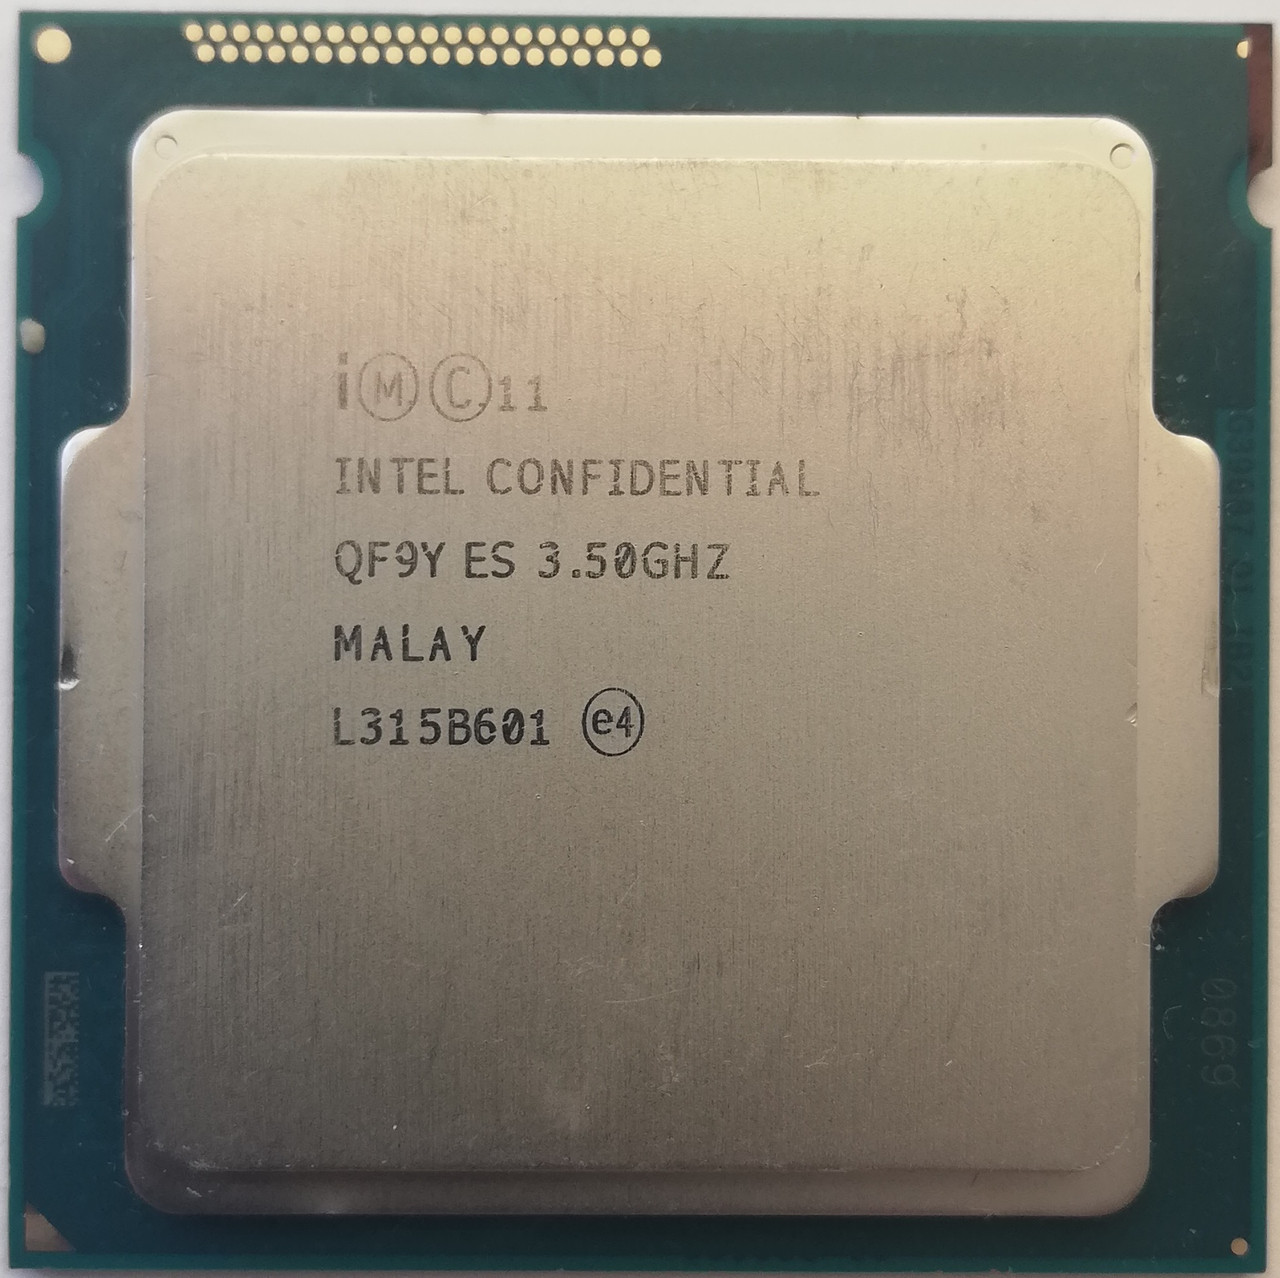 Процессор Intel Core i7 - 4771 C0 QF9Y 3.5GHz up 3.9GHz 8M Cache Socket 1150 Б/У